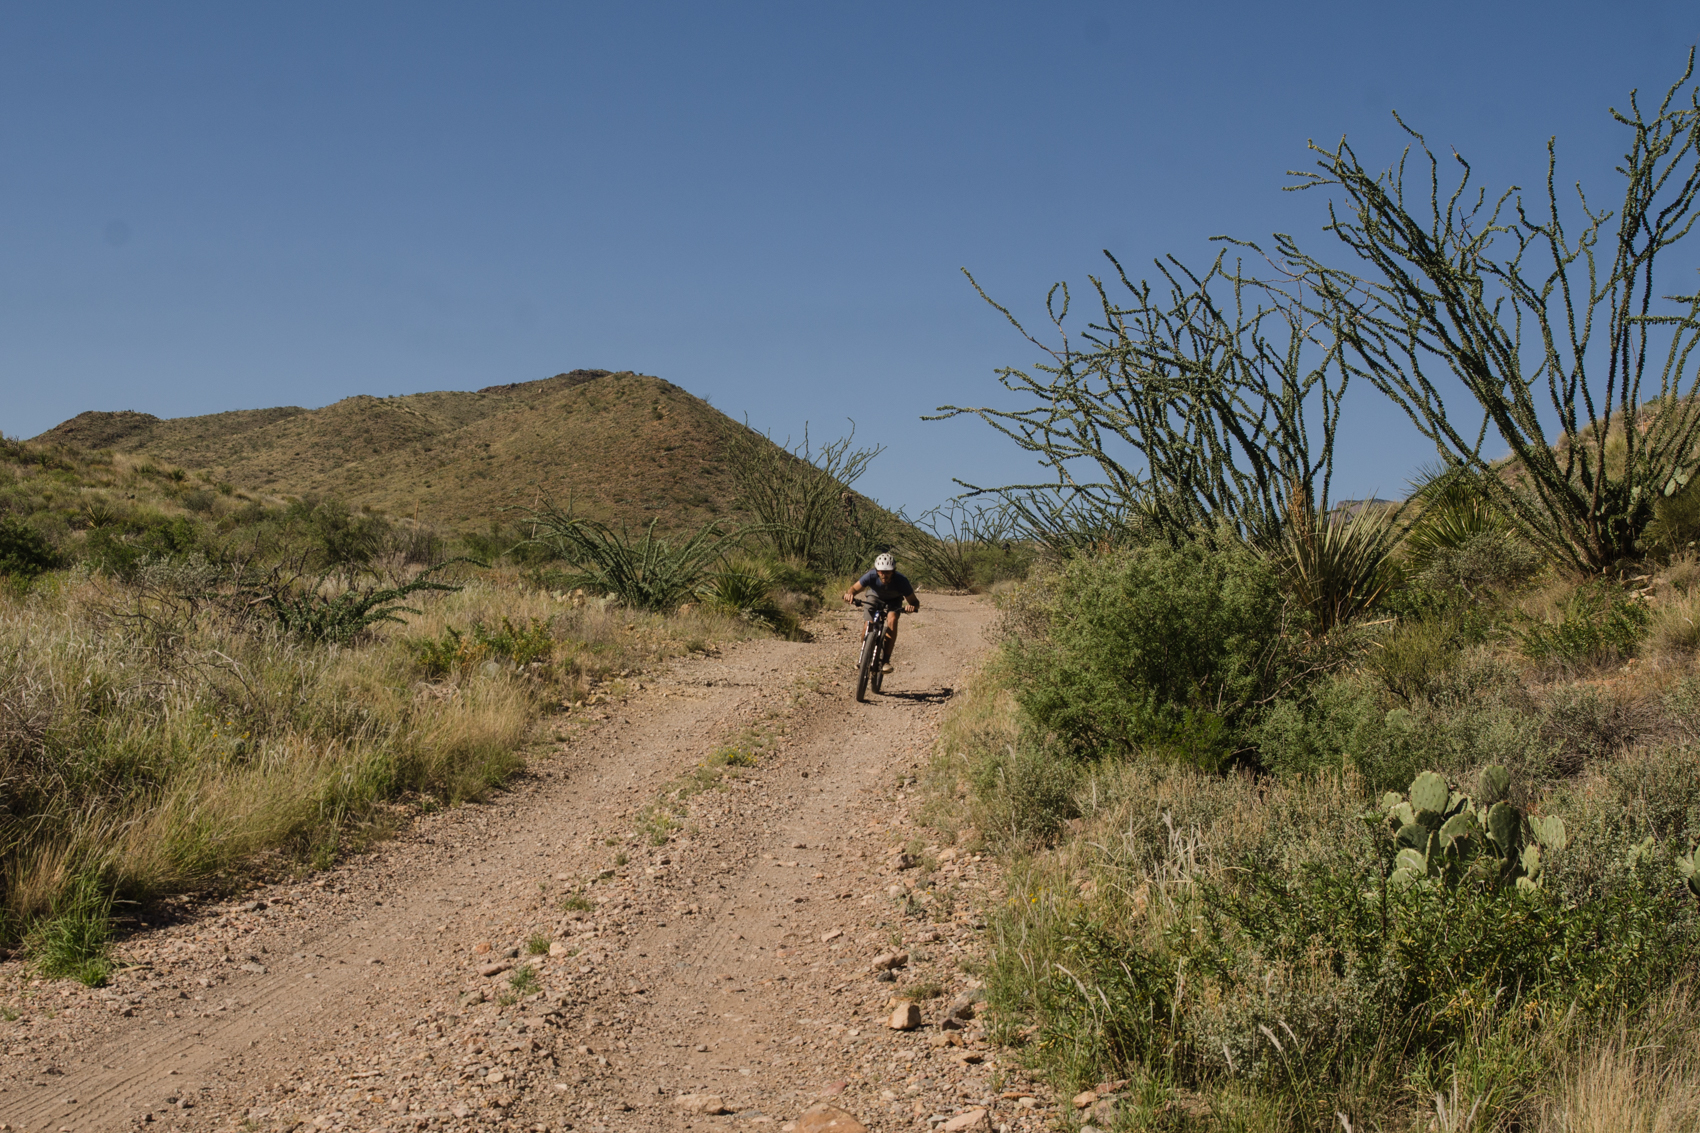 Mountain biking in big bend national park-leh cycling goods-22.jpg